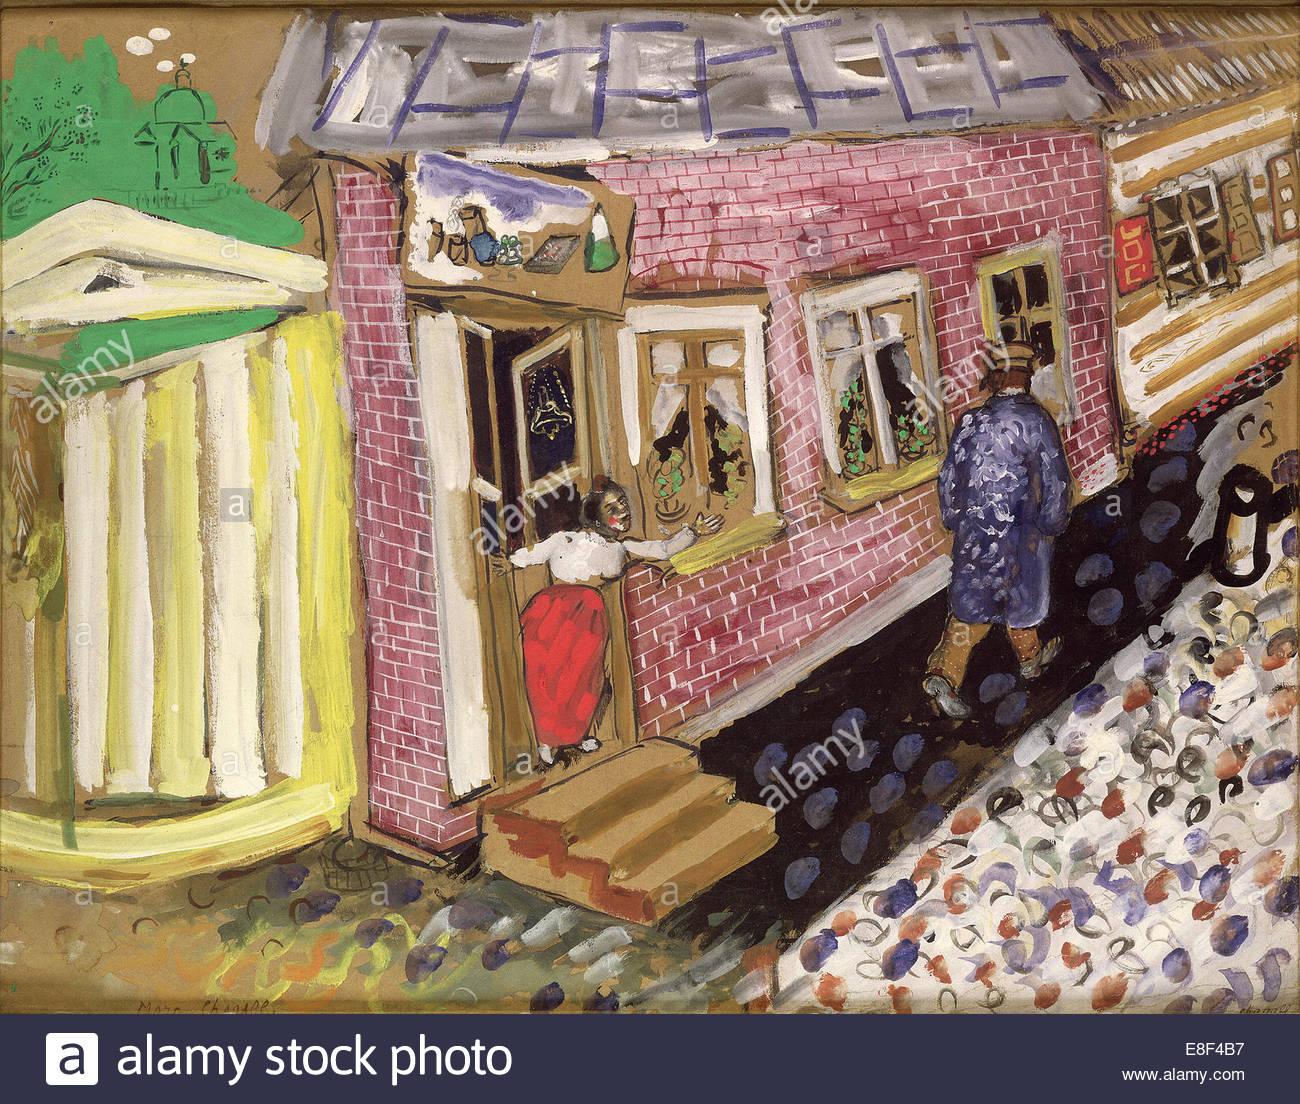 Street. Artist: Chagall, Marc (1887-1985) - Stock Image